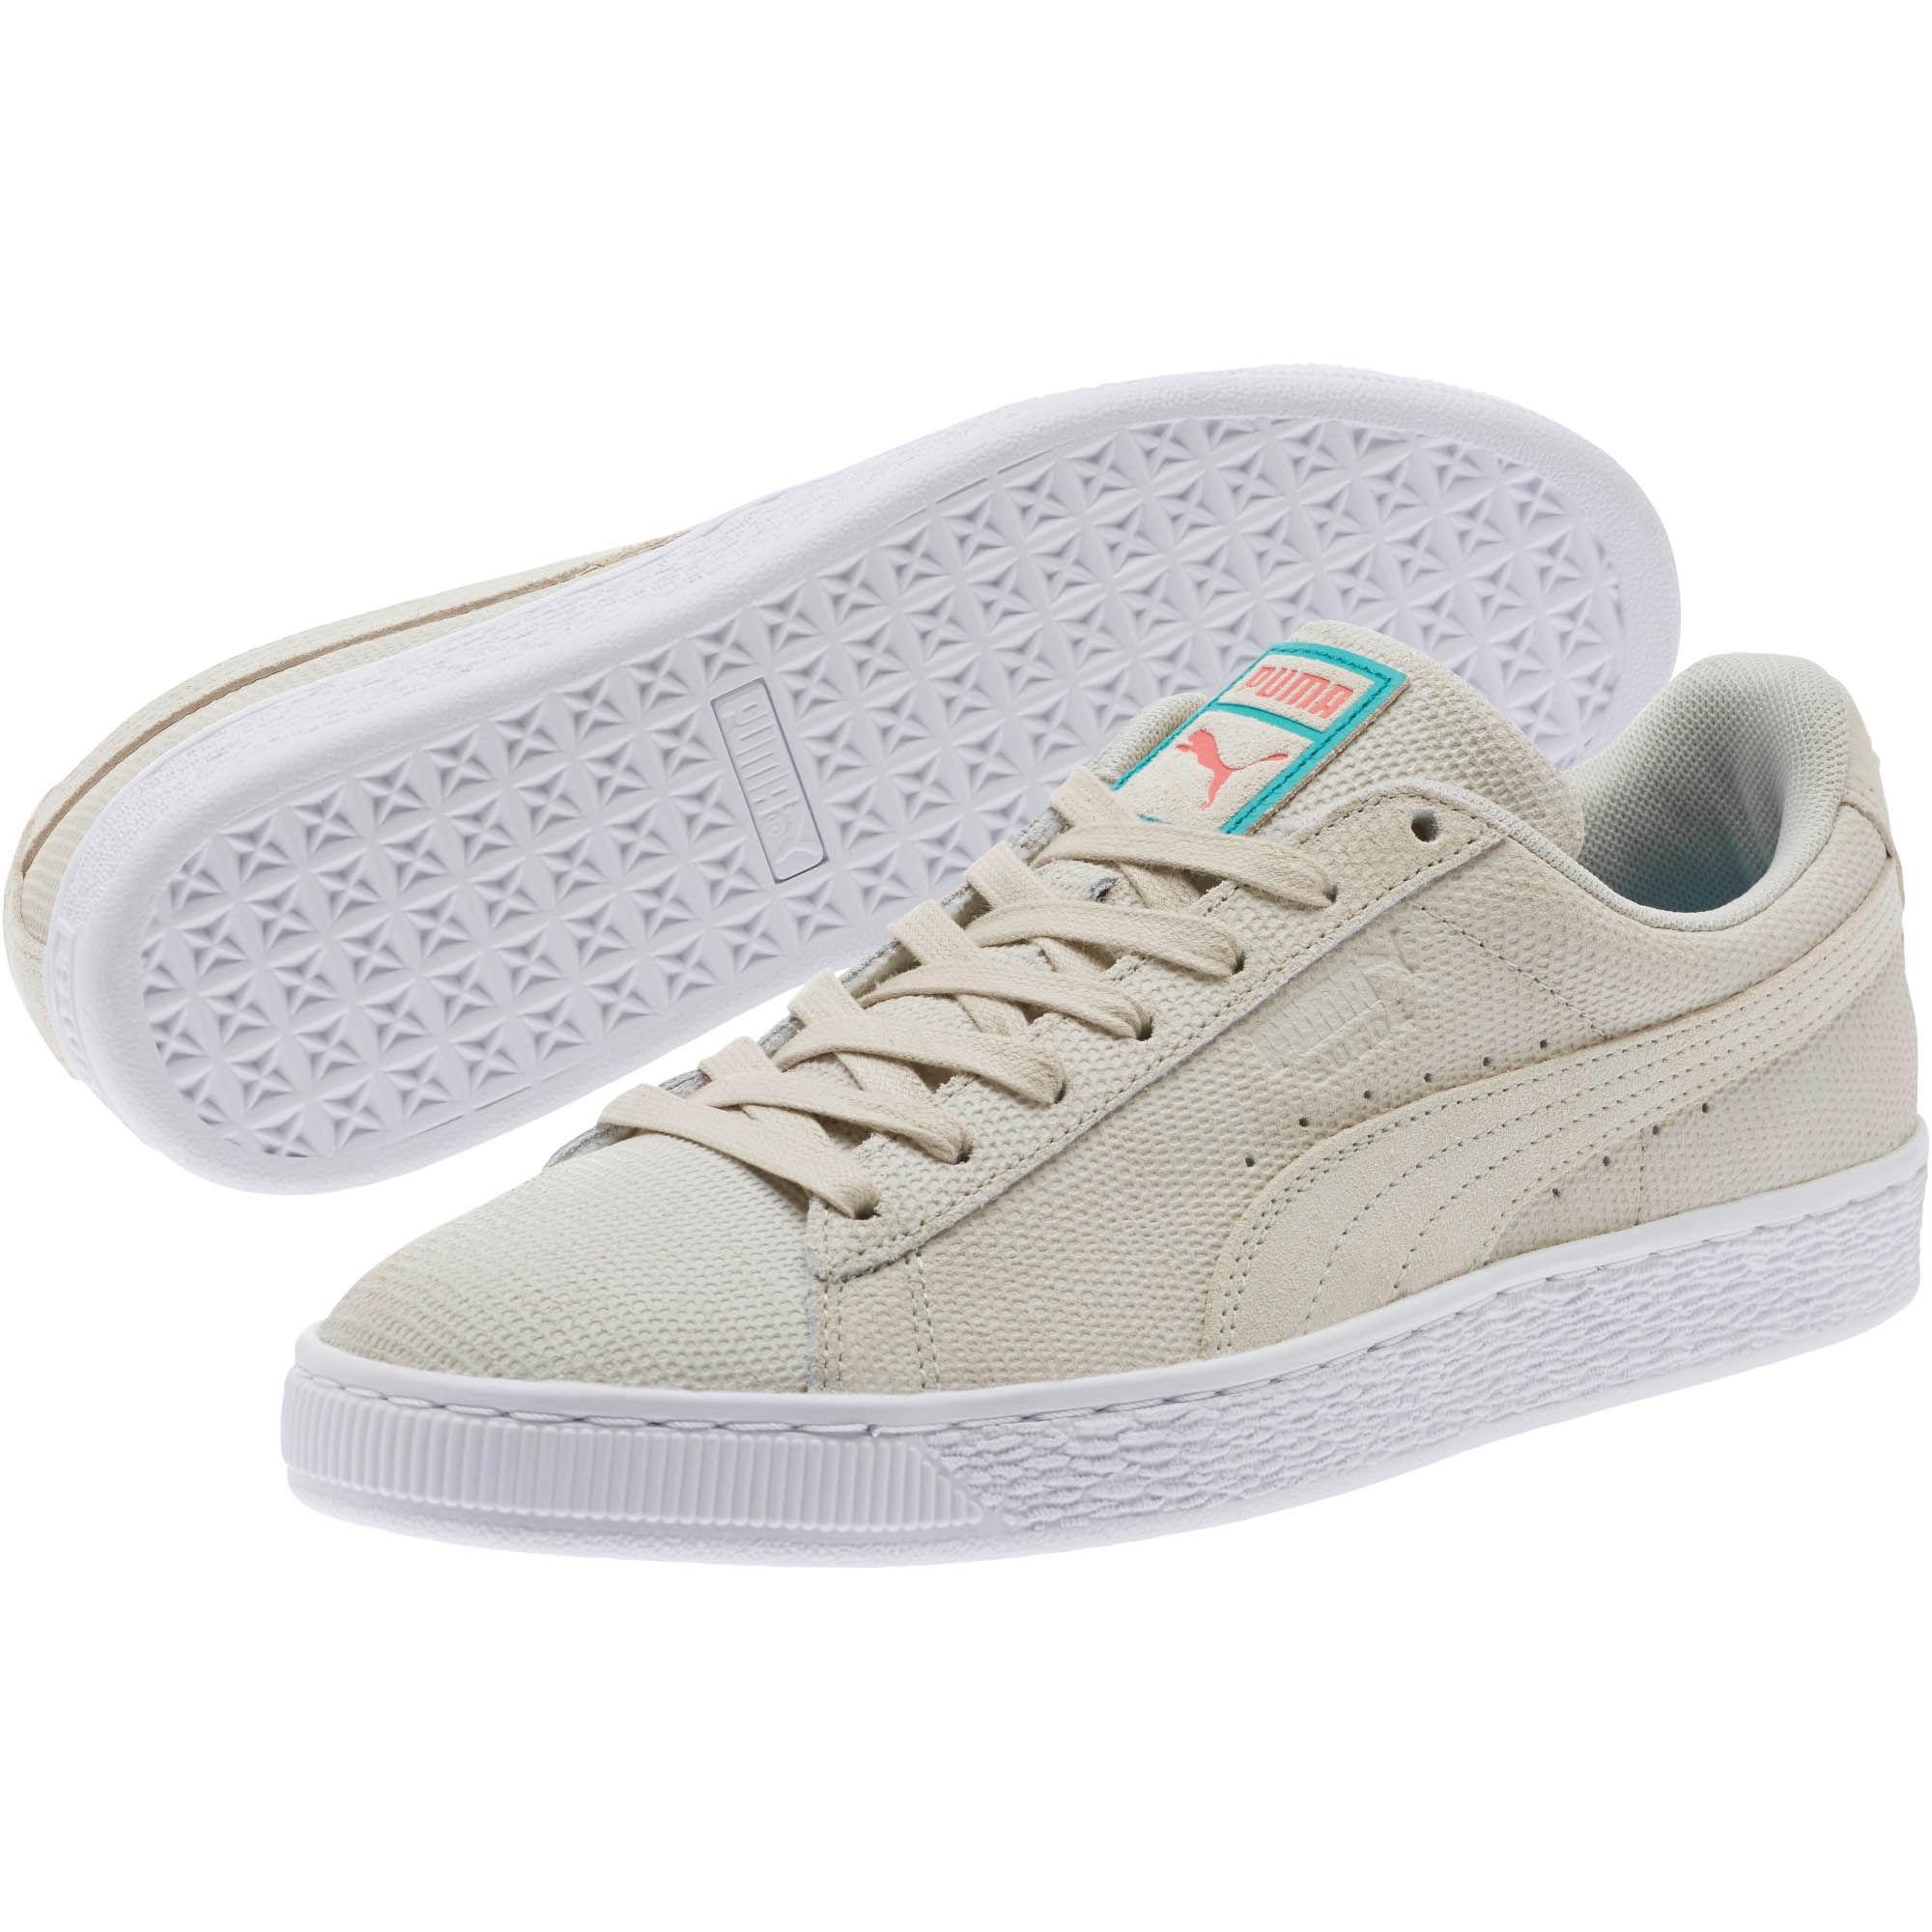 b398cf313e33 Lyst - PUMA Suede Caribbean Sand Men s Sneakers for Men